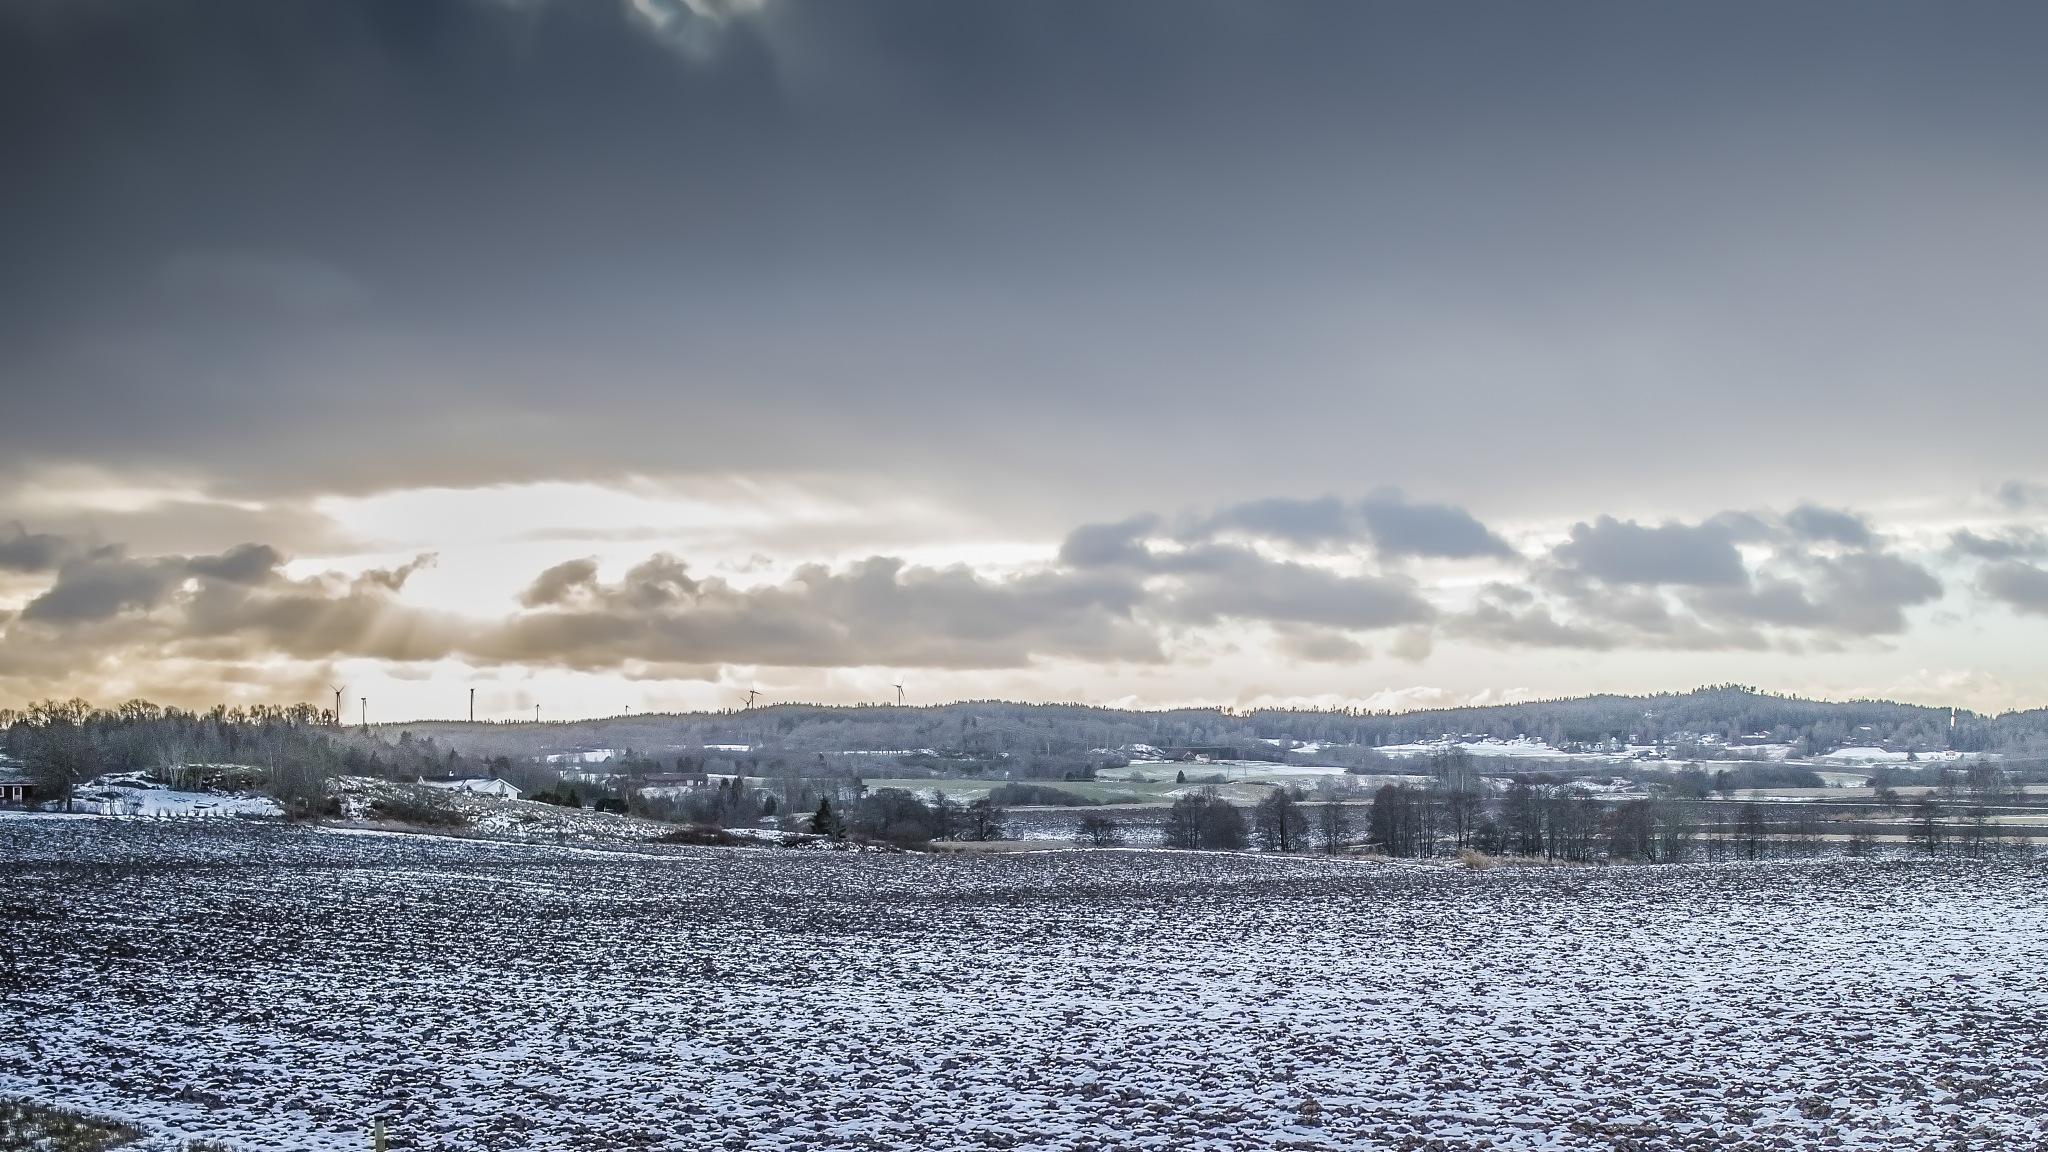 The Very First Snow by carljan w carlsson